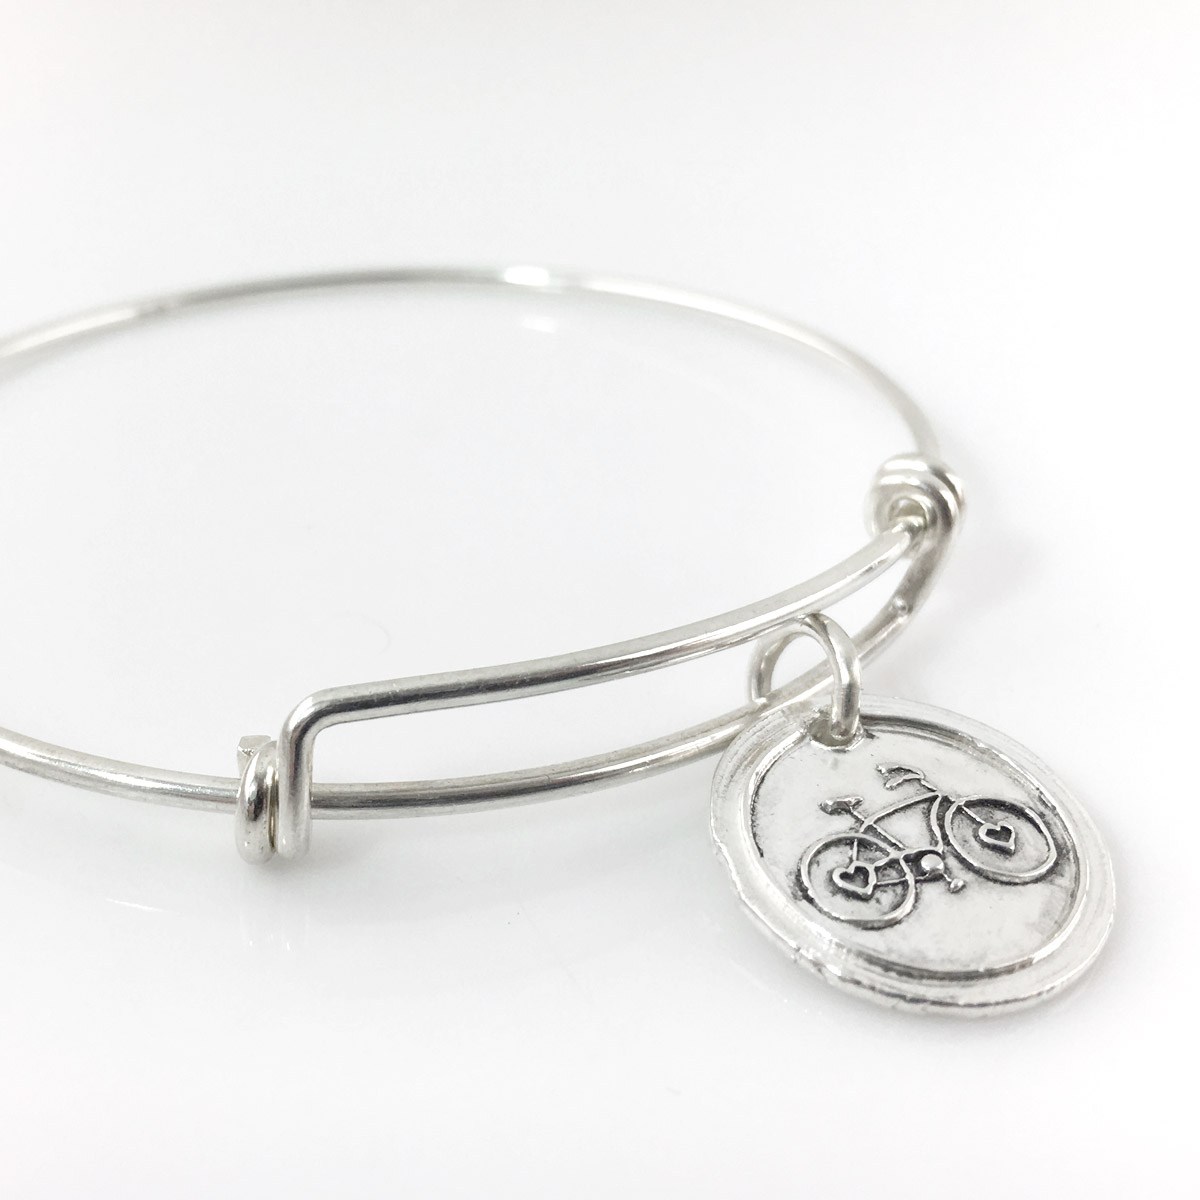 Bicycle Wax Seal Inspired Bangle Bracelet